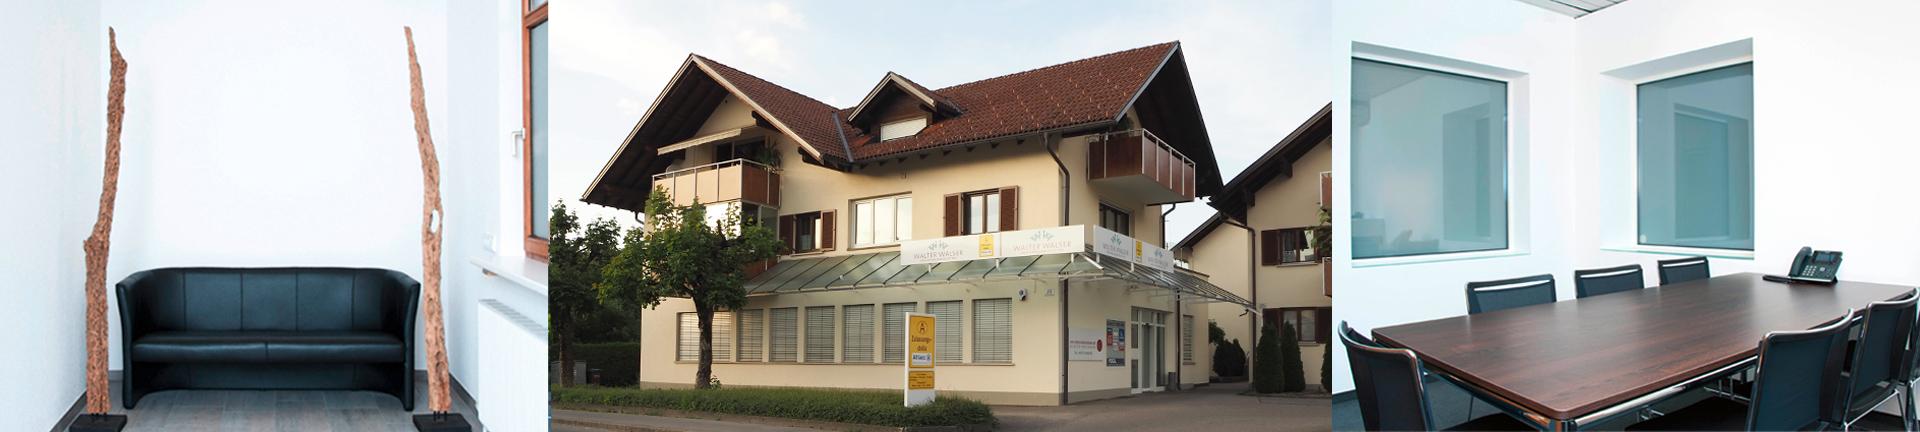 Kfz Insassen Versicherung Walter Walser Versicherungsmakler Gmbh